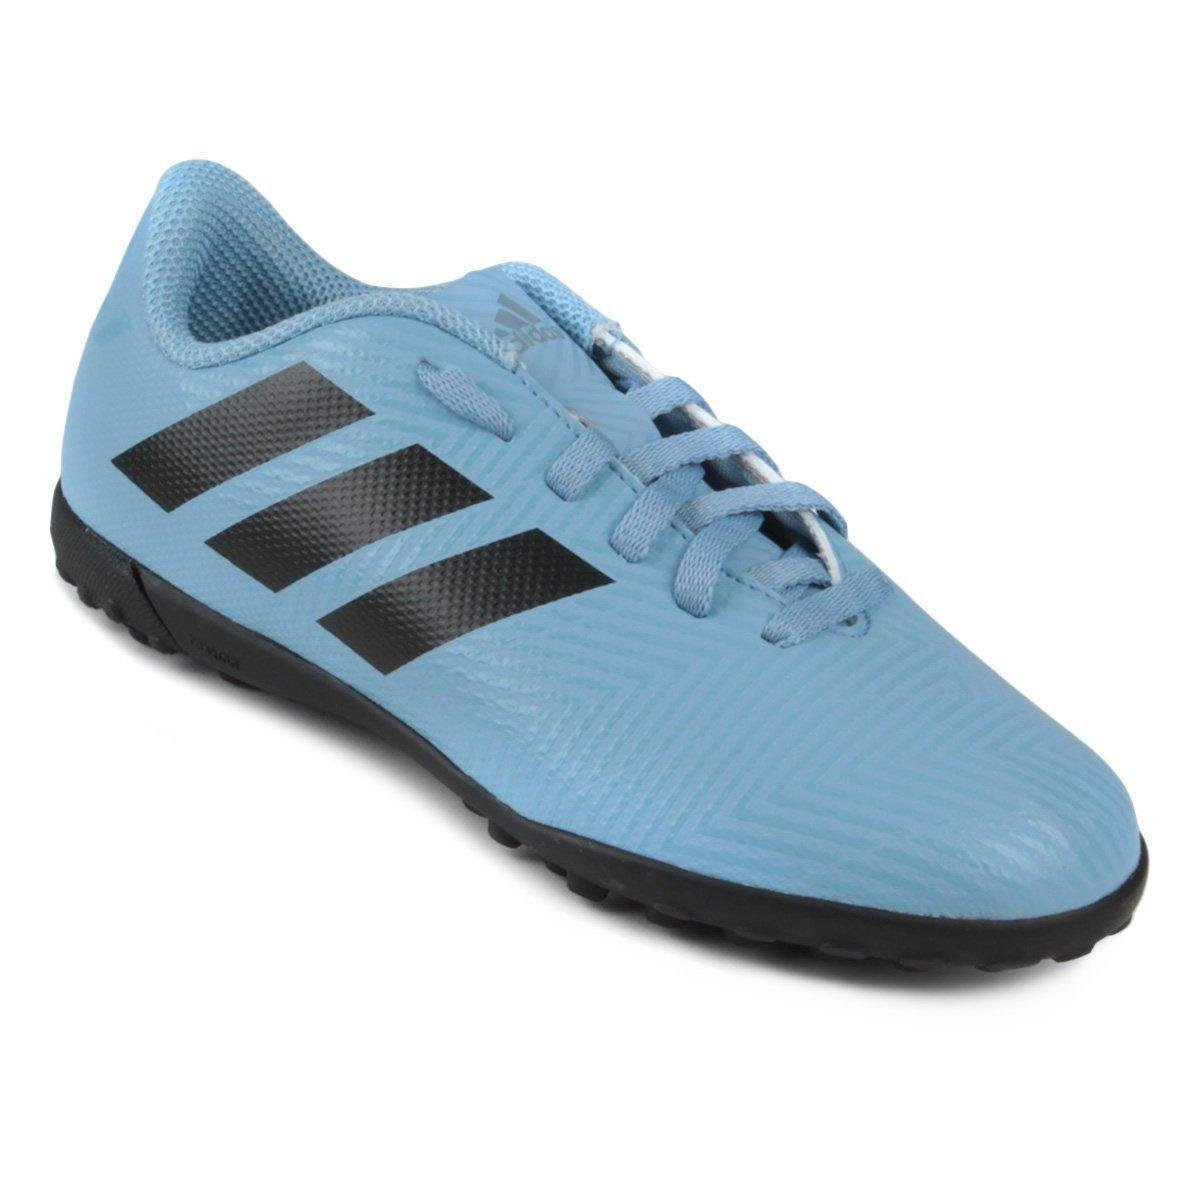 94466b16b44 Chuteira Society Infantil Adidas Nemeziz Messi 18 4 Tf Azul E